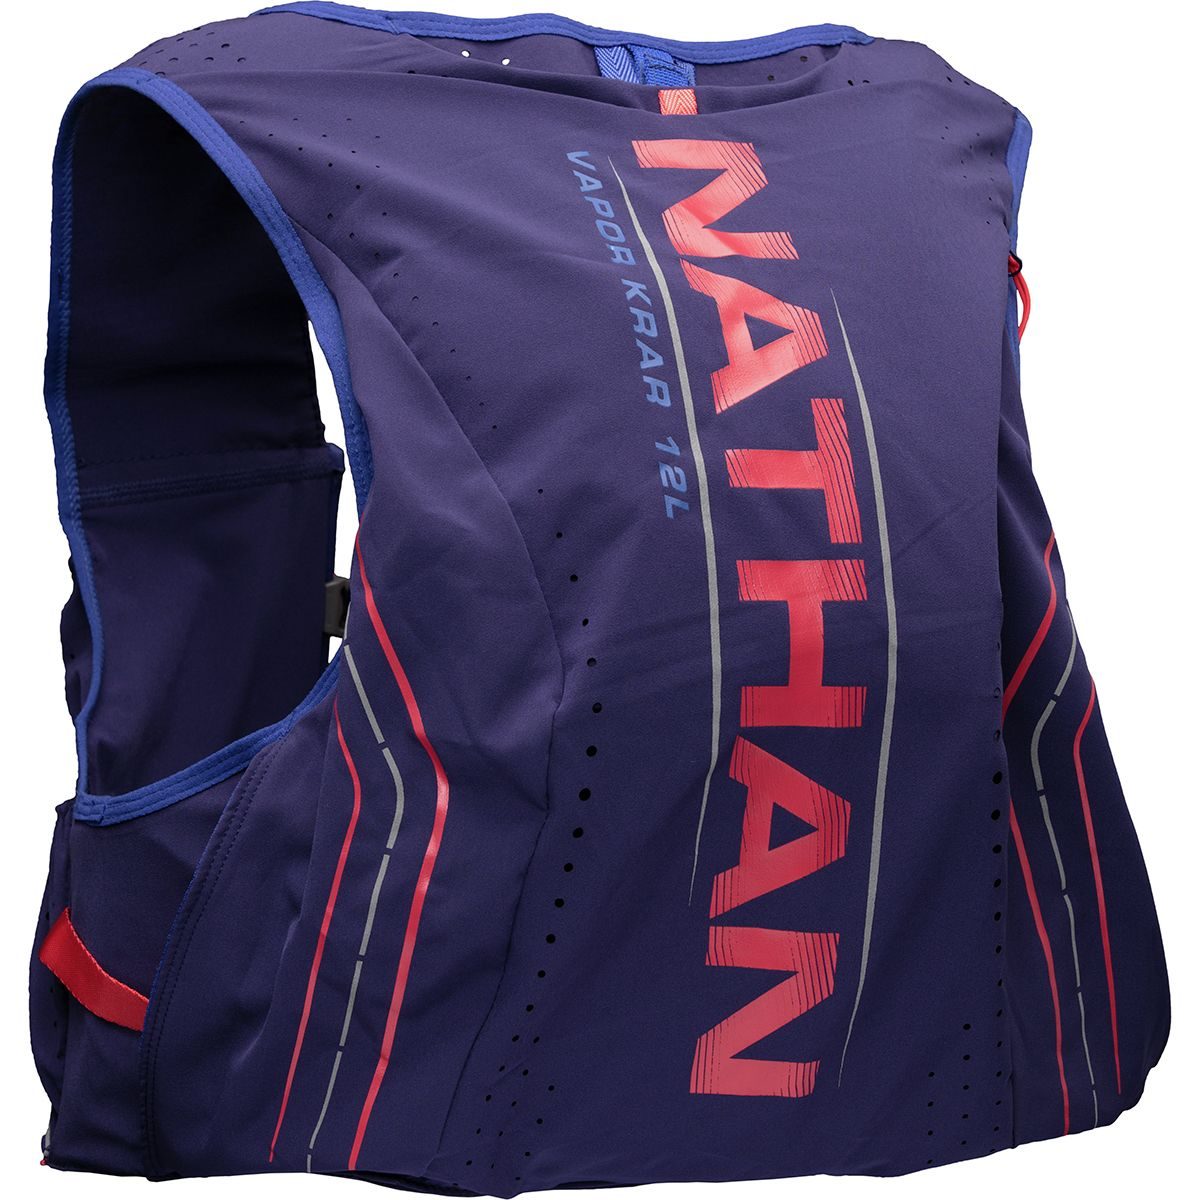 Nathan vaporkrar 12 L 2.0 Insulated Hydratation Gilet